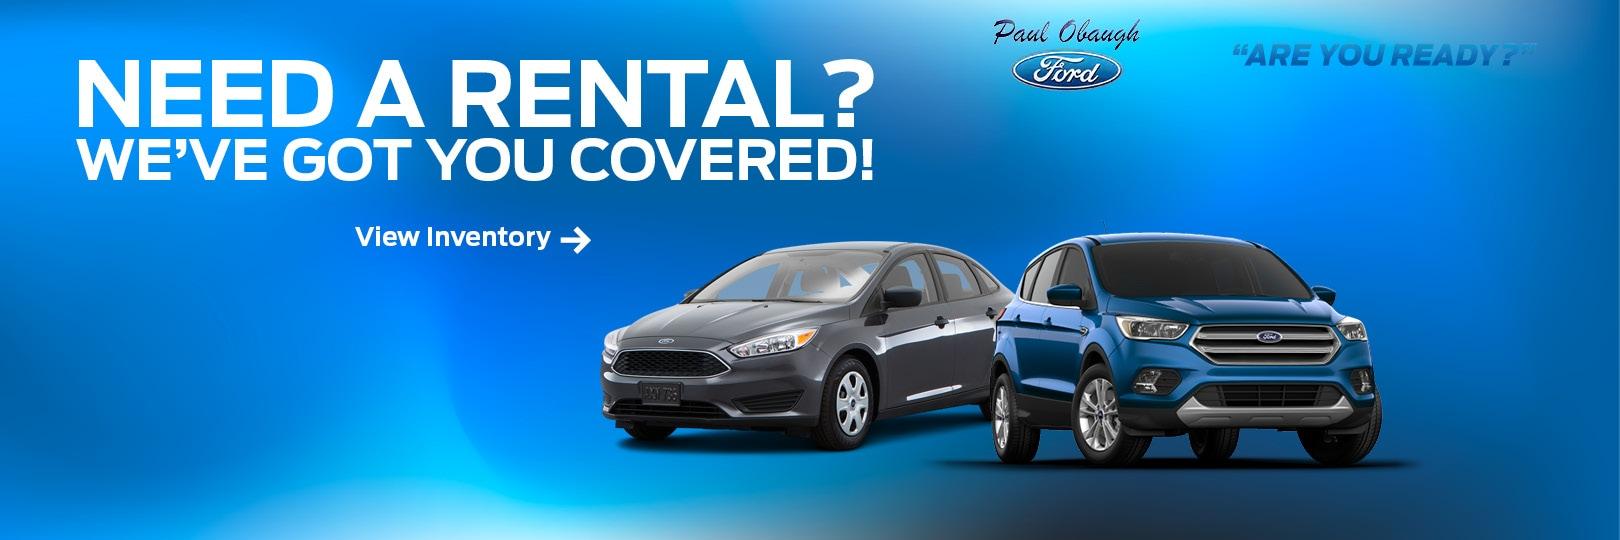 Paul Obaugh Ford >> Paul Obaugh Ford | Ford Dealership in Staunton VA